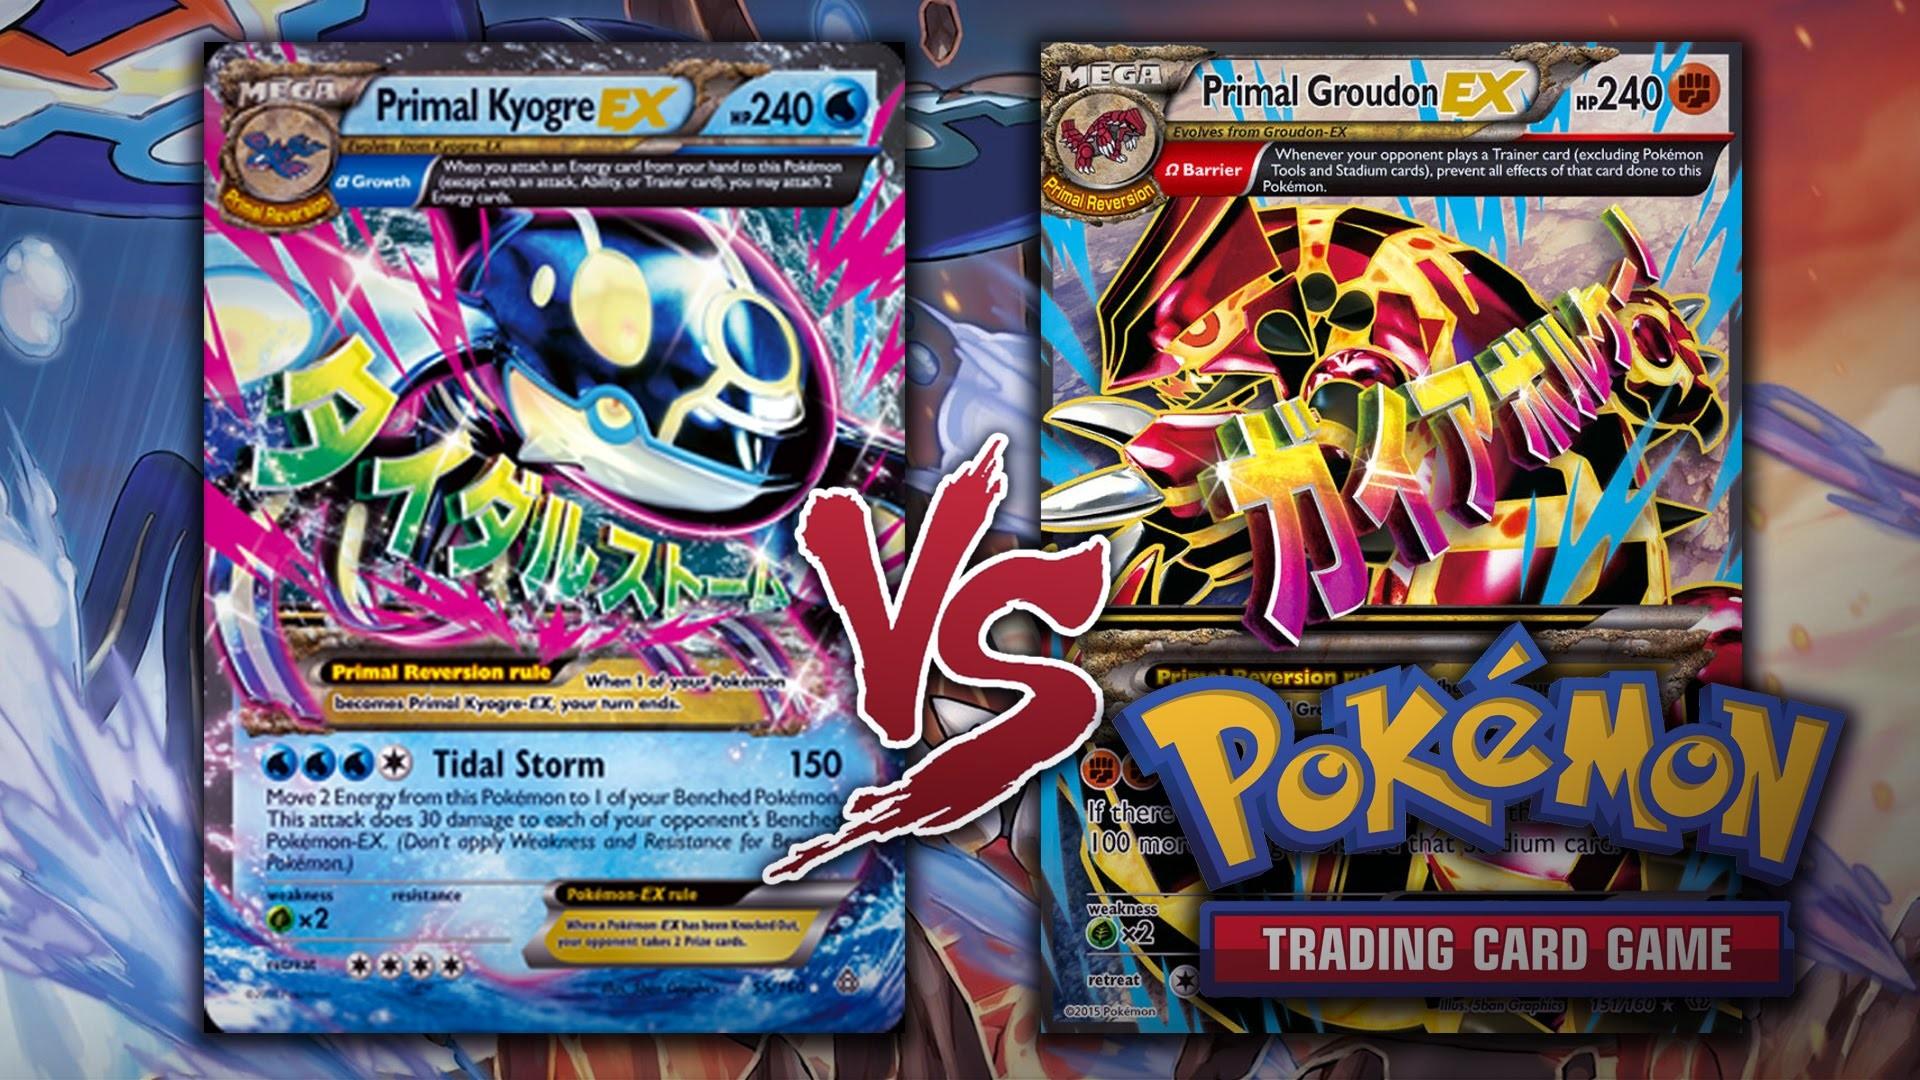 POKÉMON TRADING CARD GAME: Â¡KYOGRE PRIMIGENIO VS GROUDON PRIMIGENIO!  (TCG/JCC). – YouTube